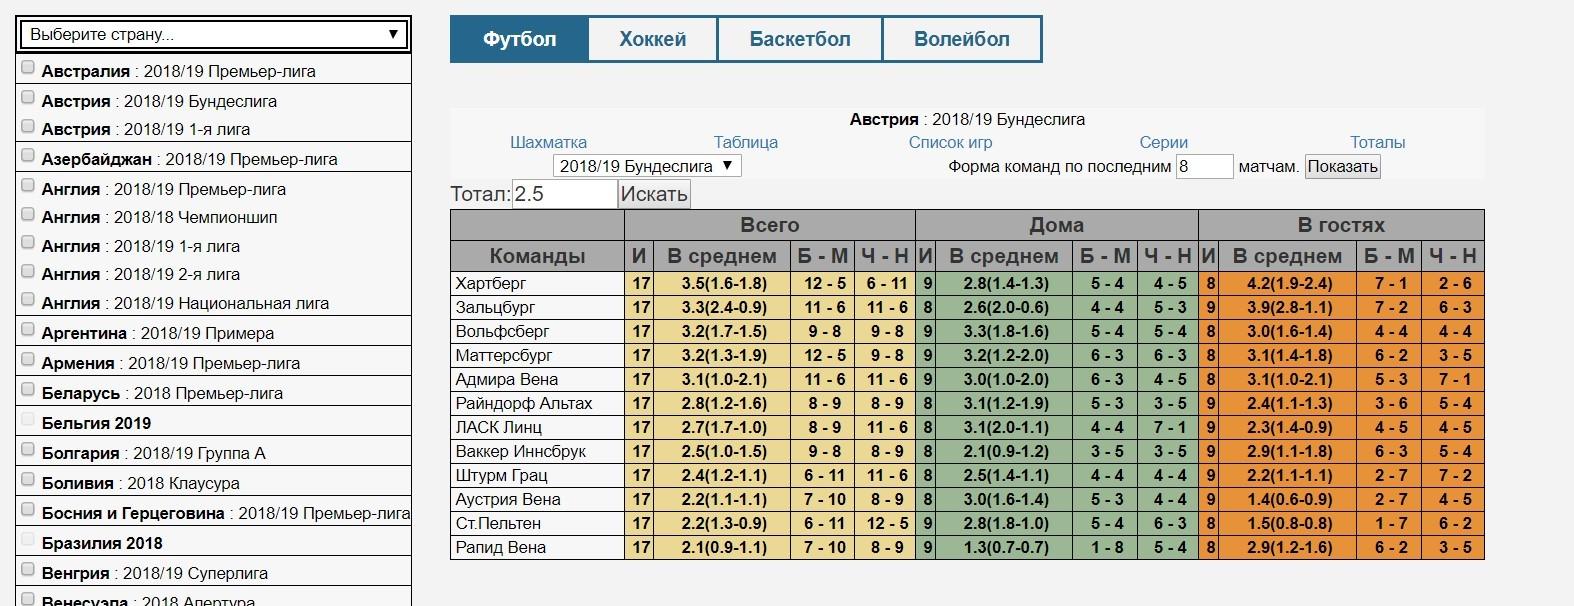 БК Фонбет ру. Статистика